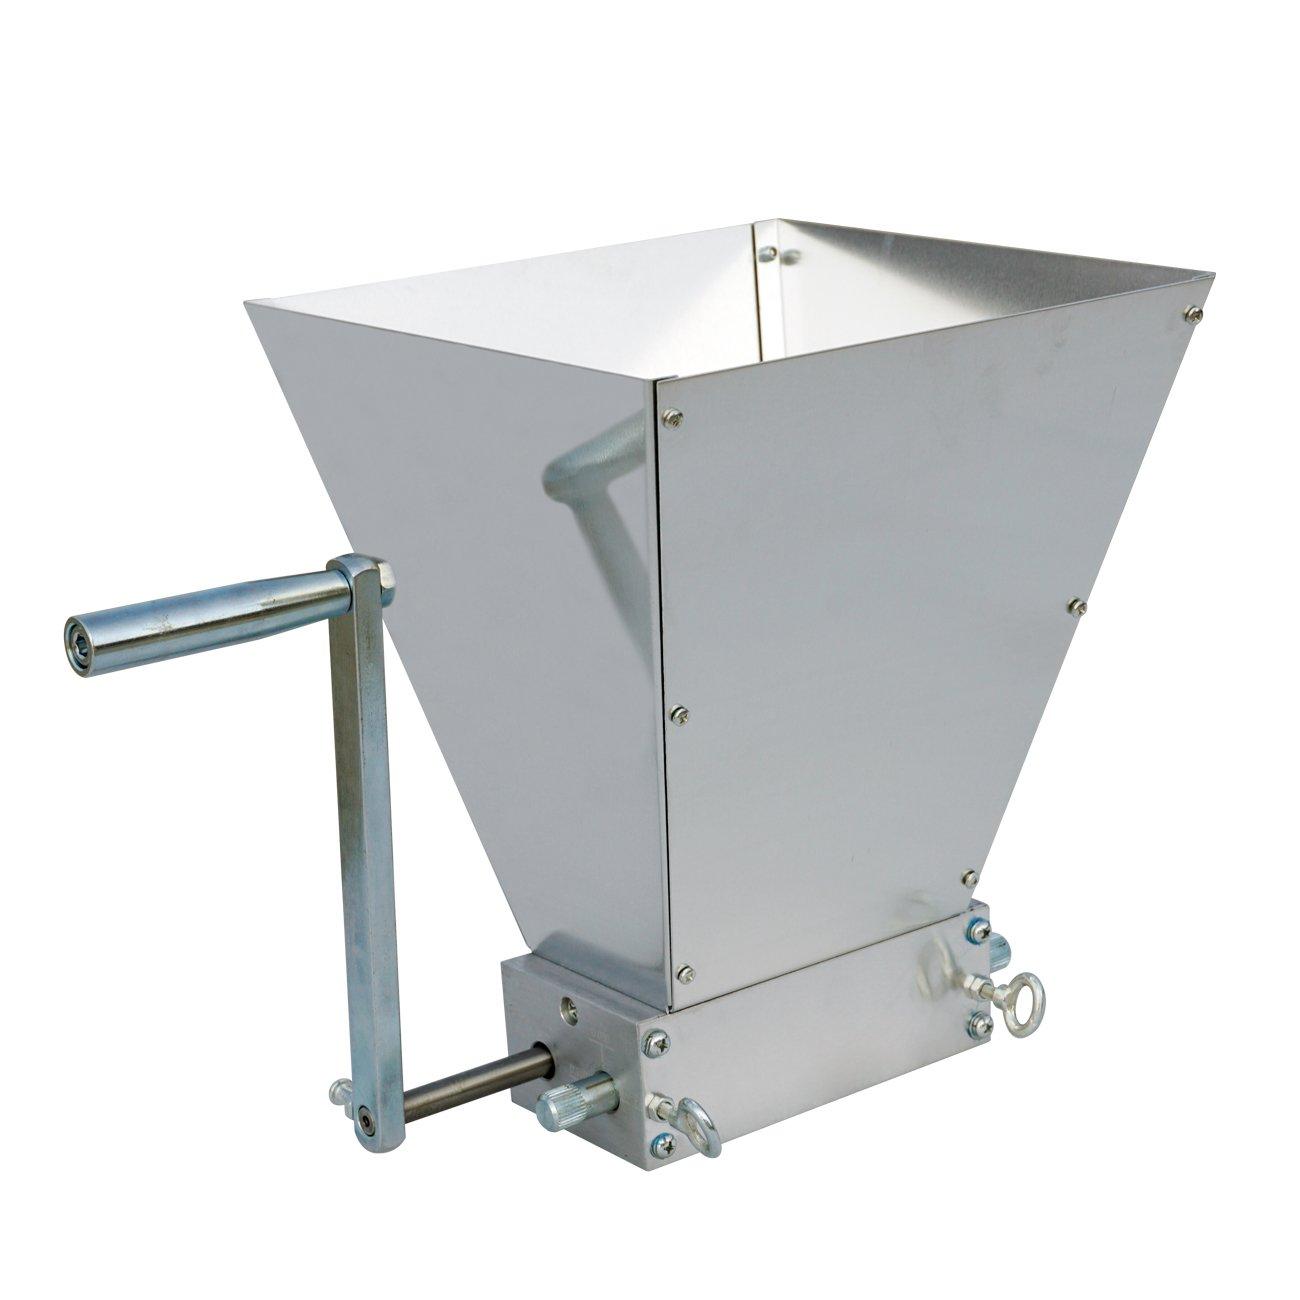 ECO-WORTHY Barley Crusher Malt Grain Mill 2-Roller Home Brewing Grain Cereal Crusher